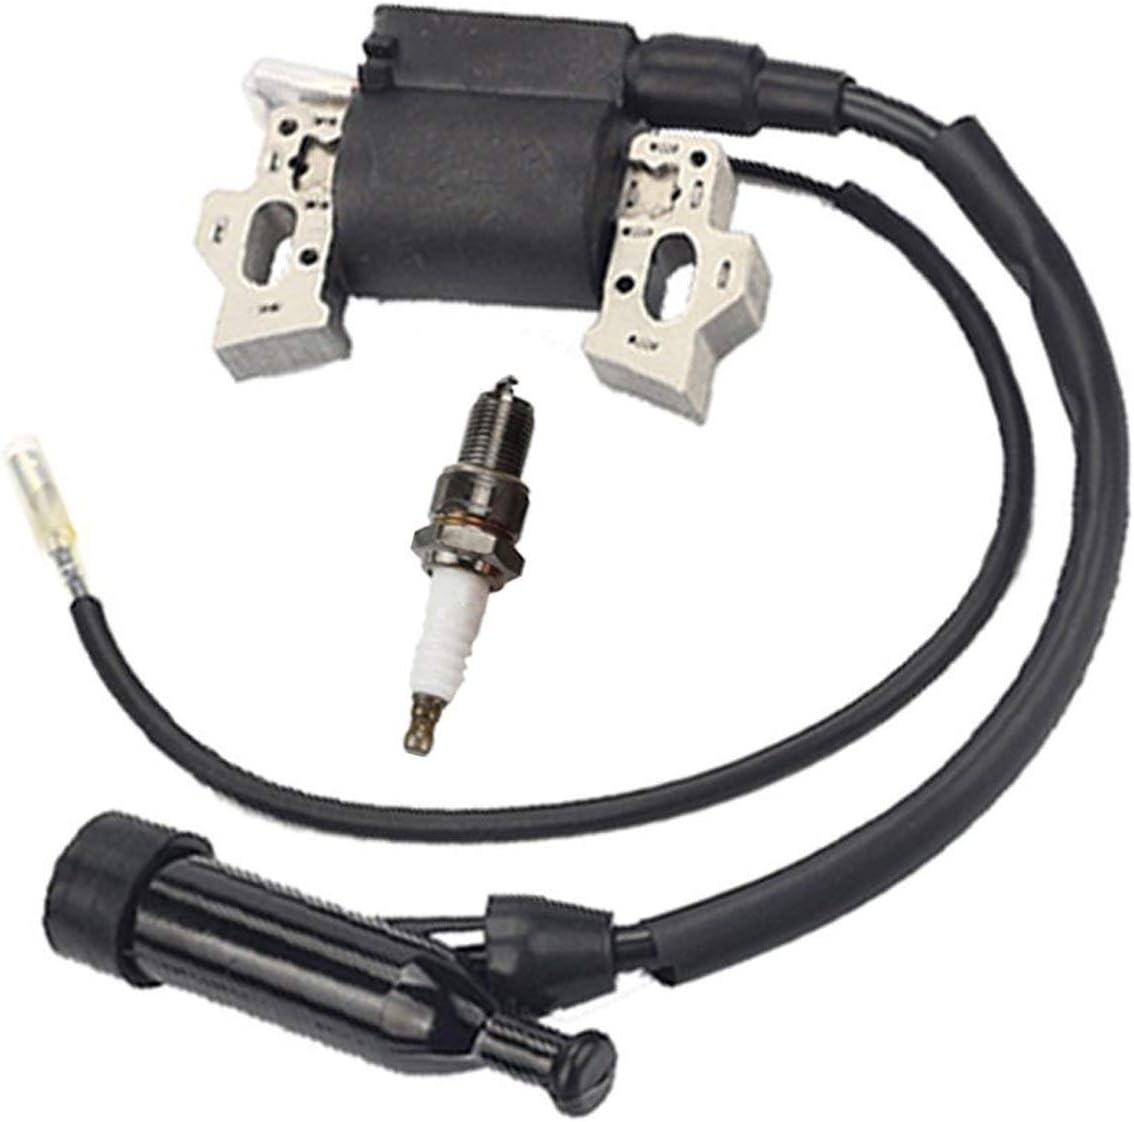 Amazon.com : Buckbock Ignition Coil for Honda Gx240 Gx270 Gx340 Gx390 8hp  9hp 11hp 13hp Engine Lawn Mower Tractor Generator w/Spark Plug : Garden &  OutdoorAmazon.com